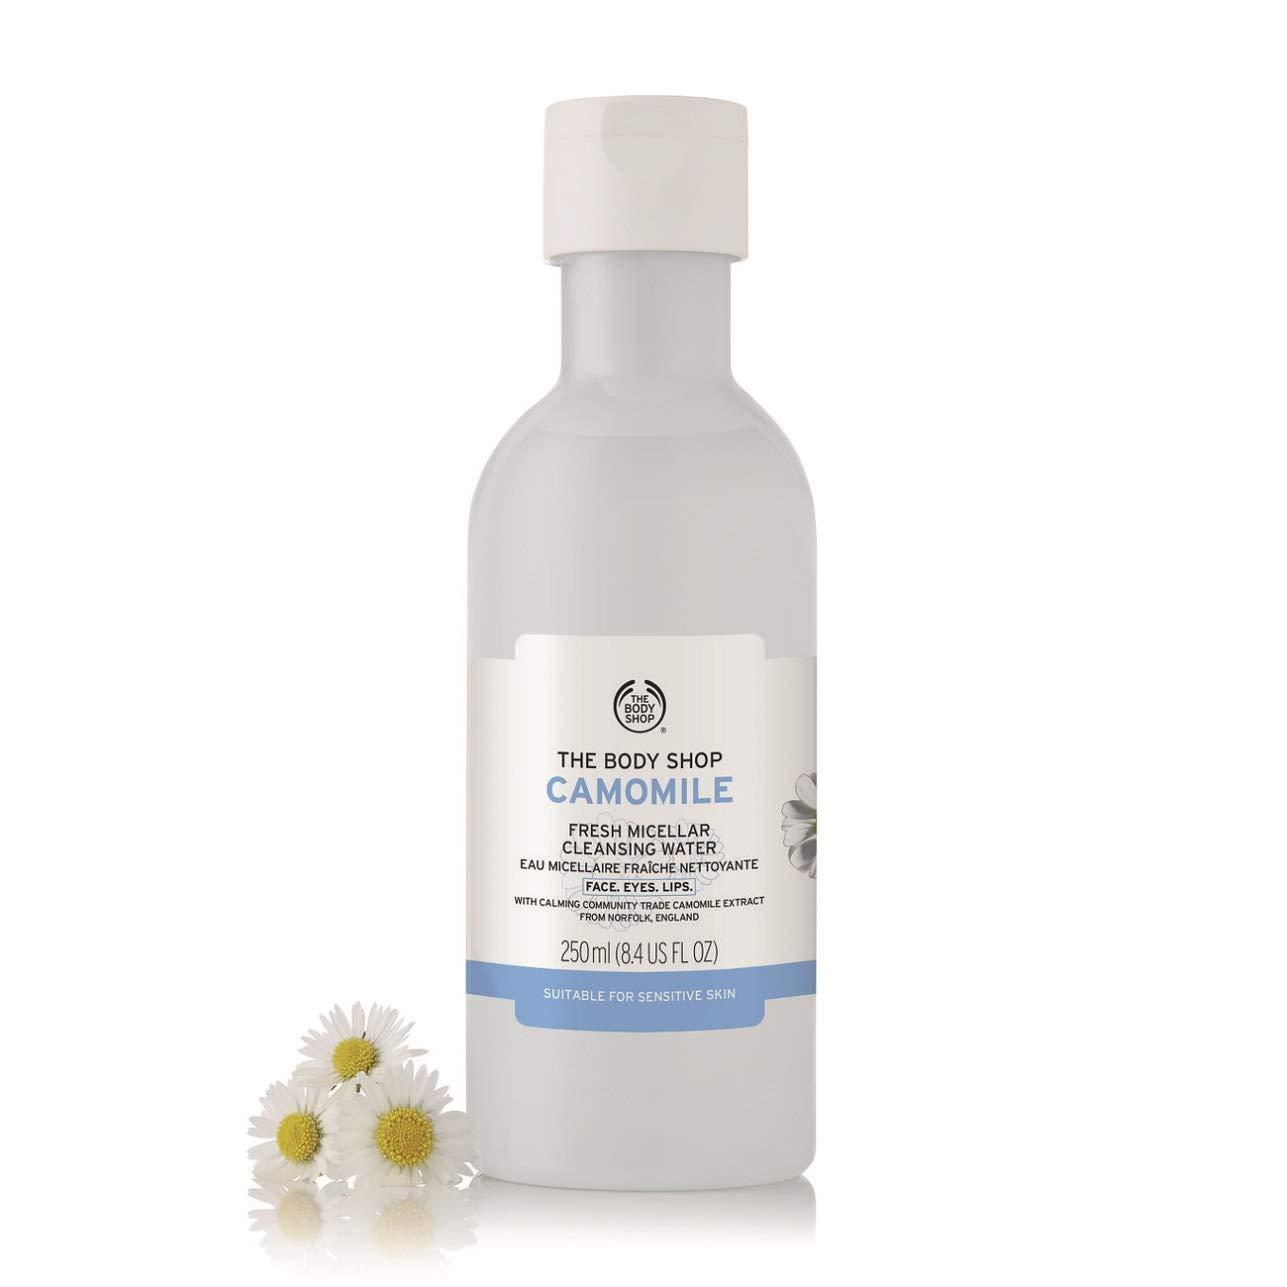 The Body Shop Agua de limpieza micelar de manzanilla fresca - Edición limitada: Amazon.es: Belleza